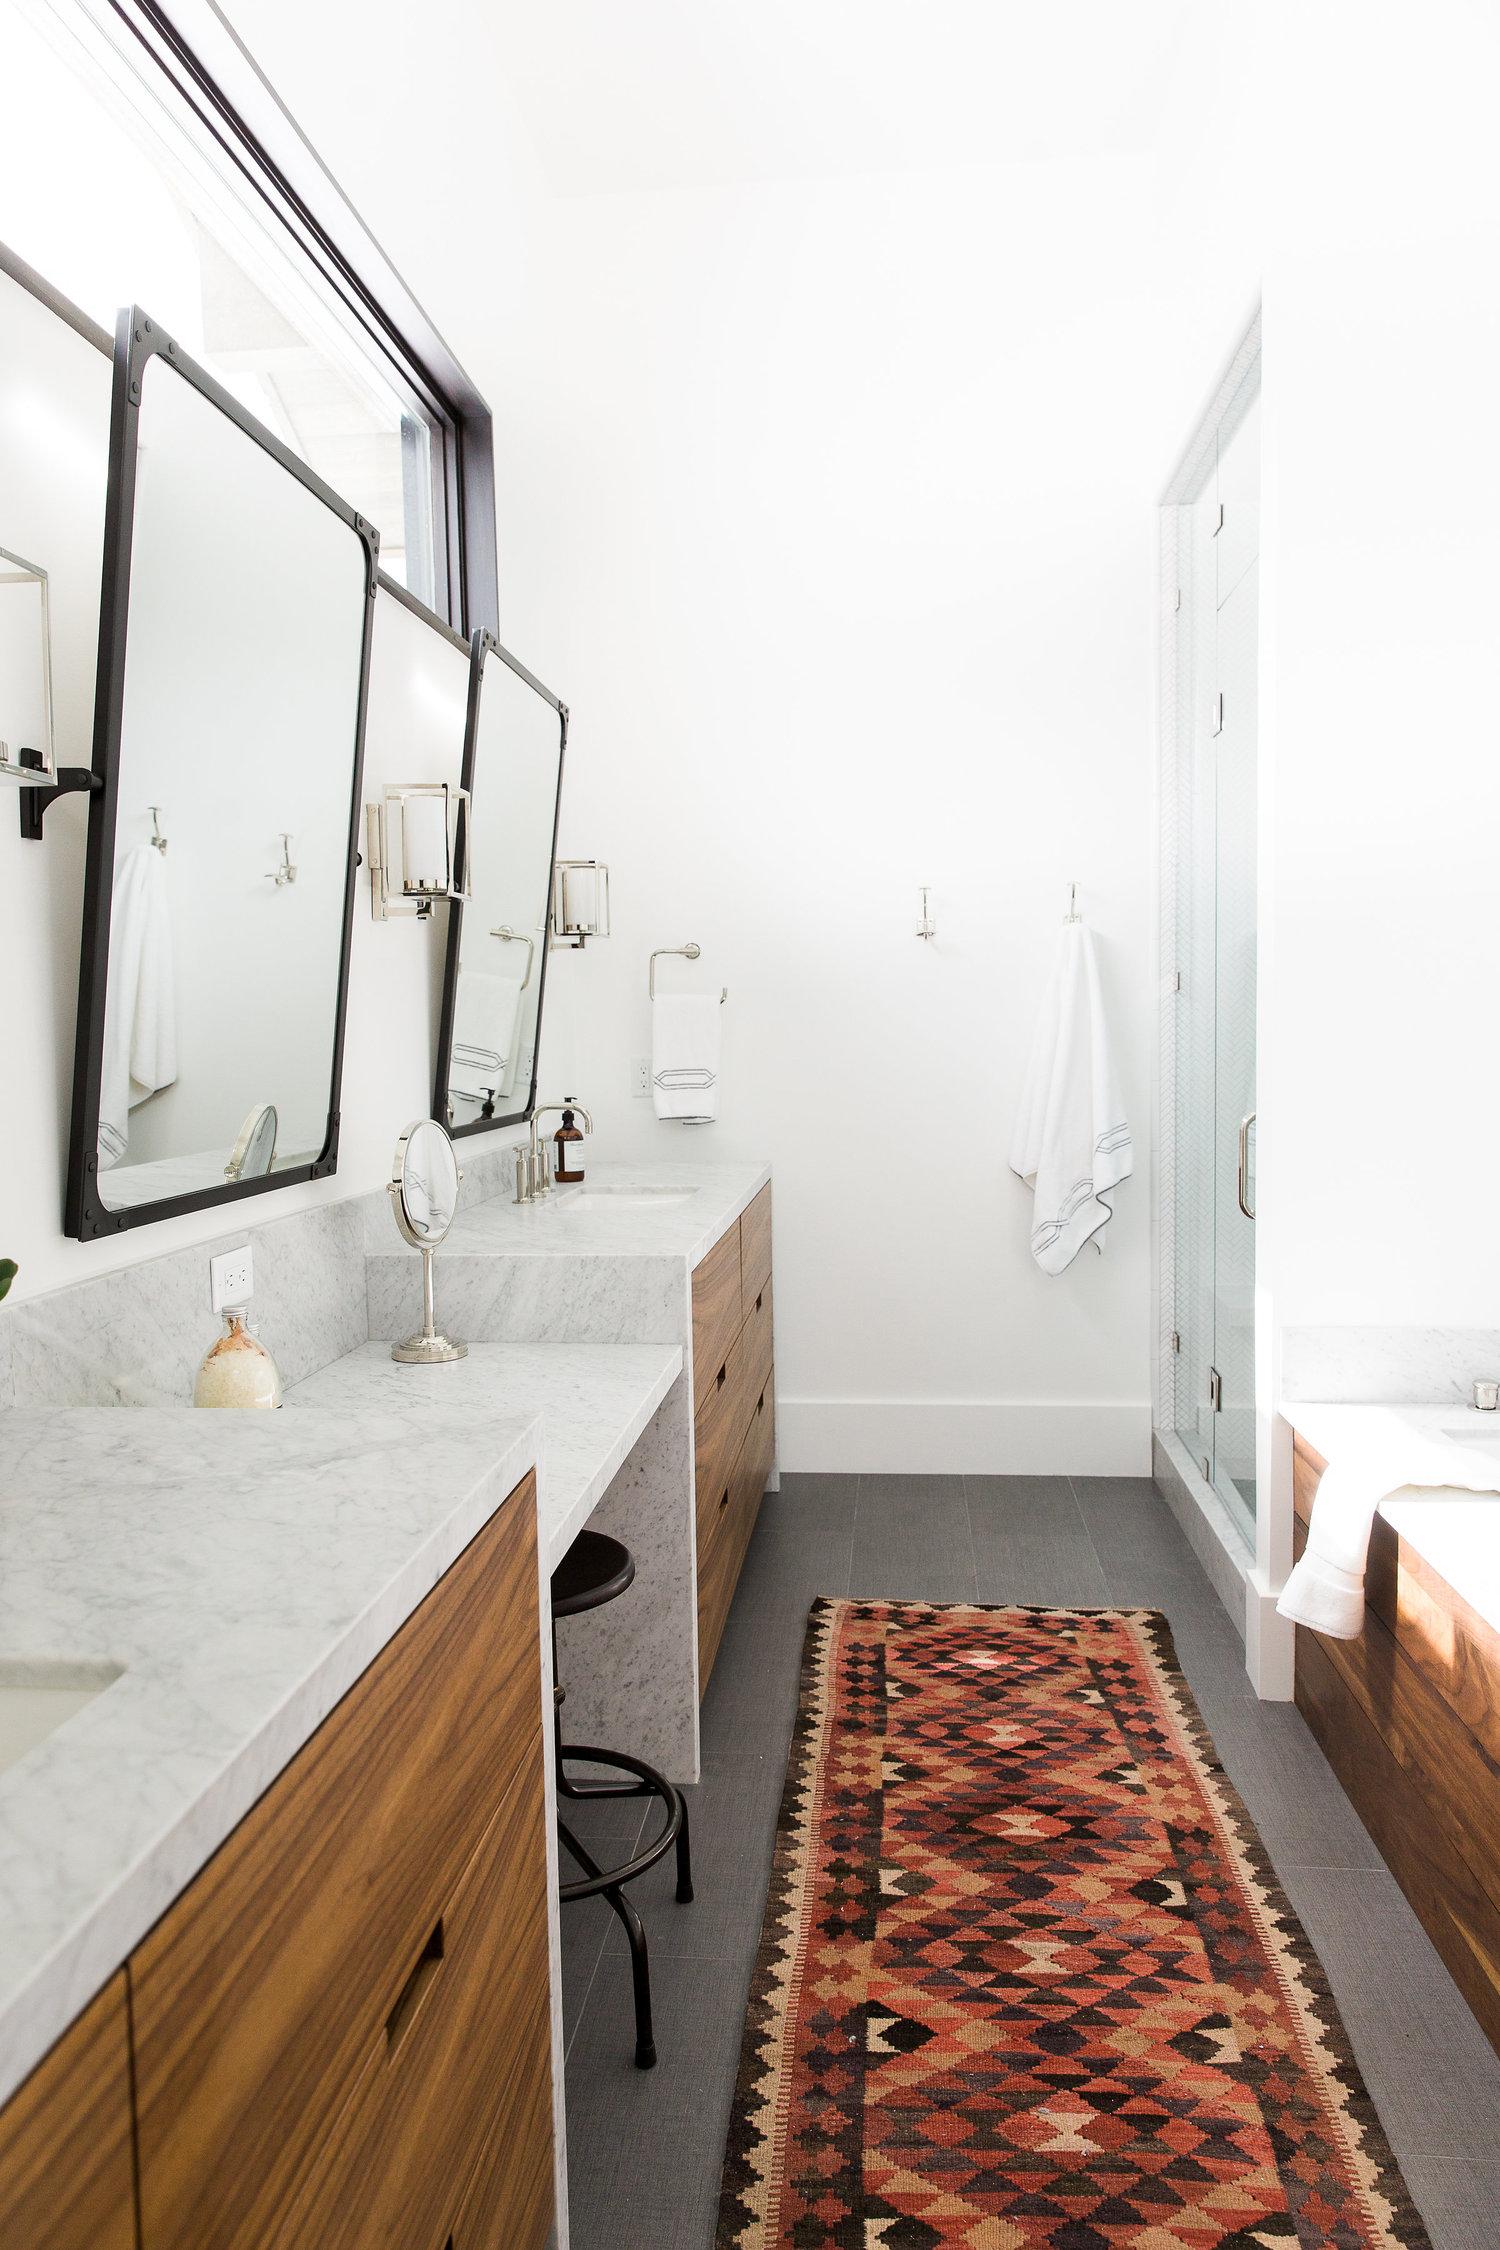 Decorative runner carpet in bathroom